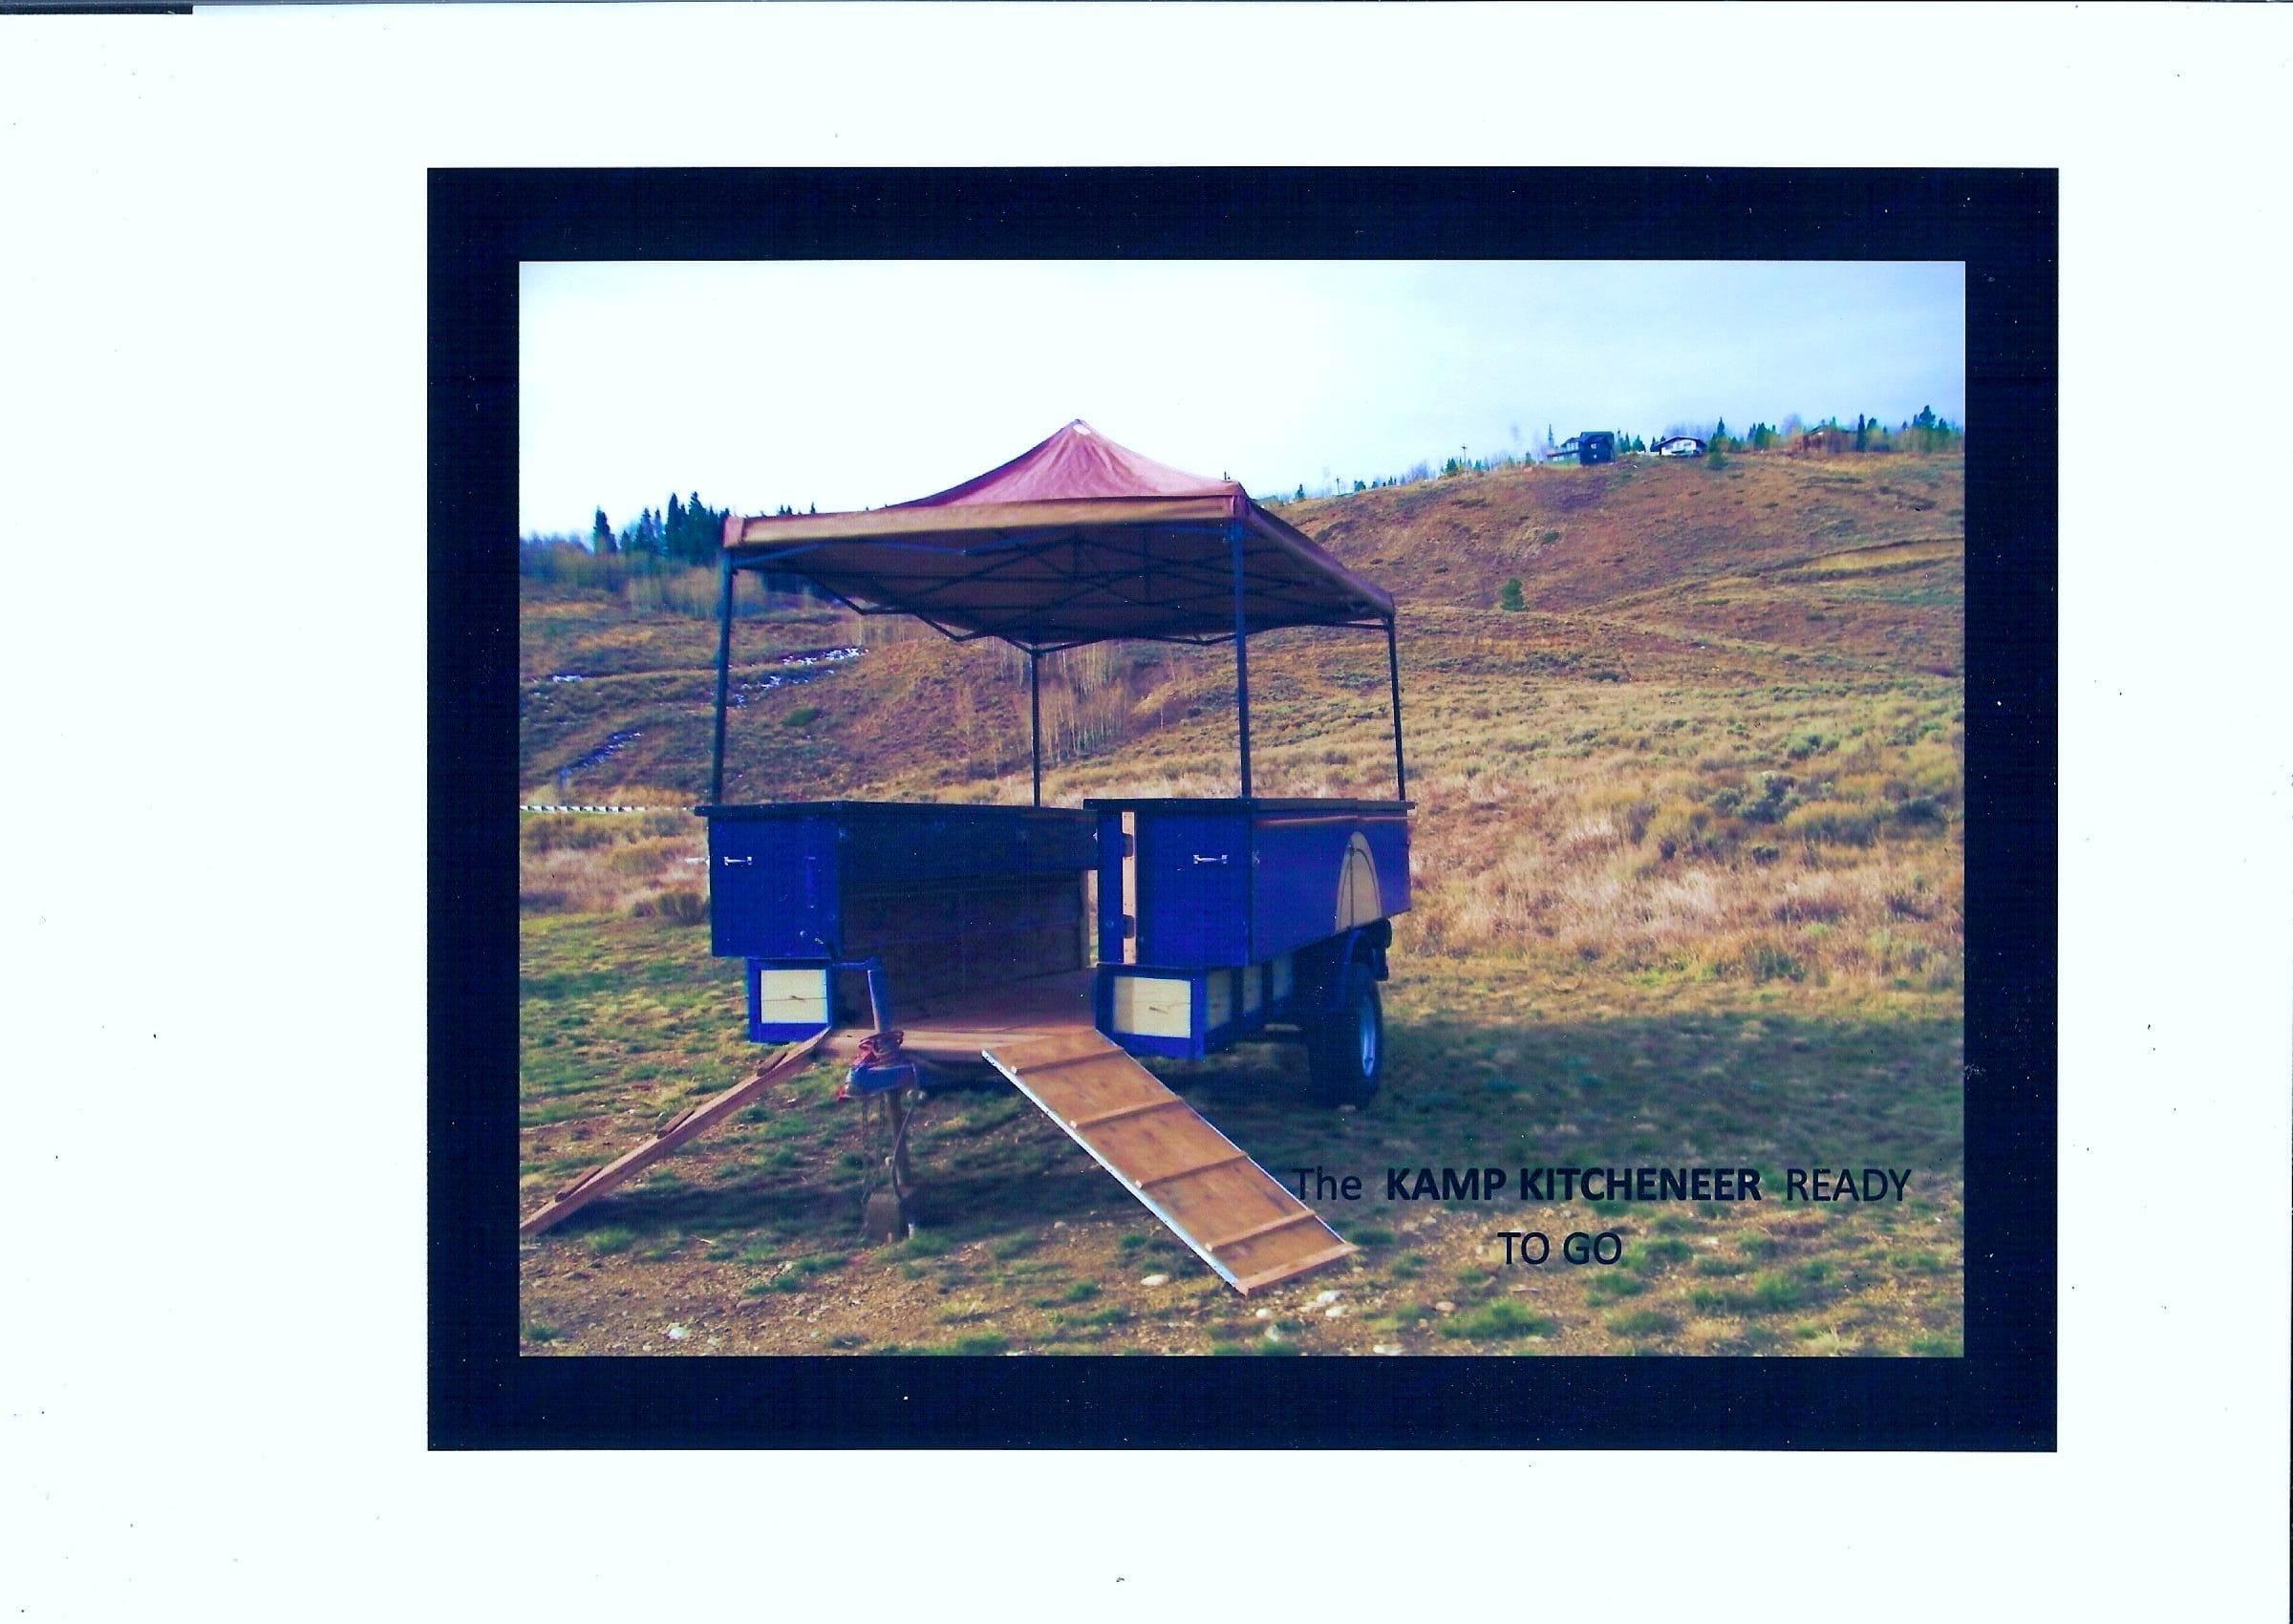 Kamp Kitcheneer Ready To Go. Private manufacturer Kamp Kitcheneer Off Road Kitchen Trailer 2016